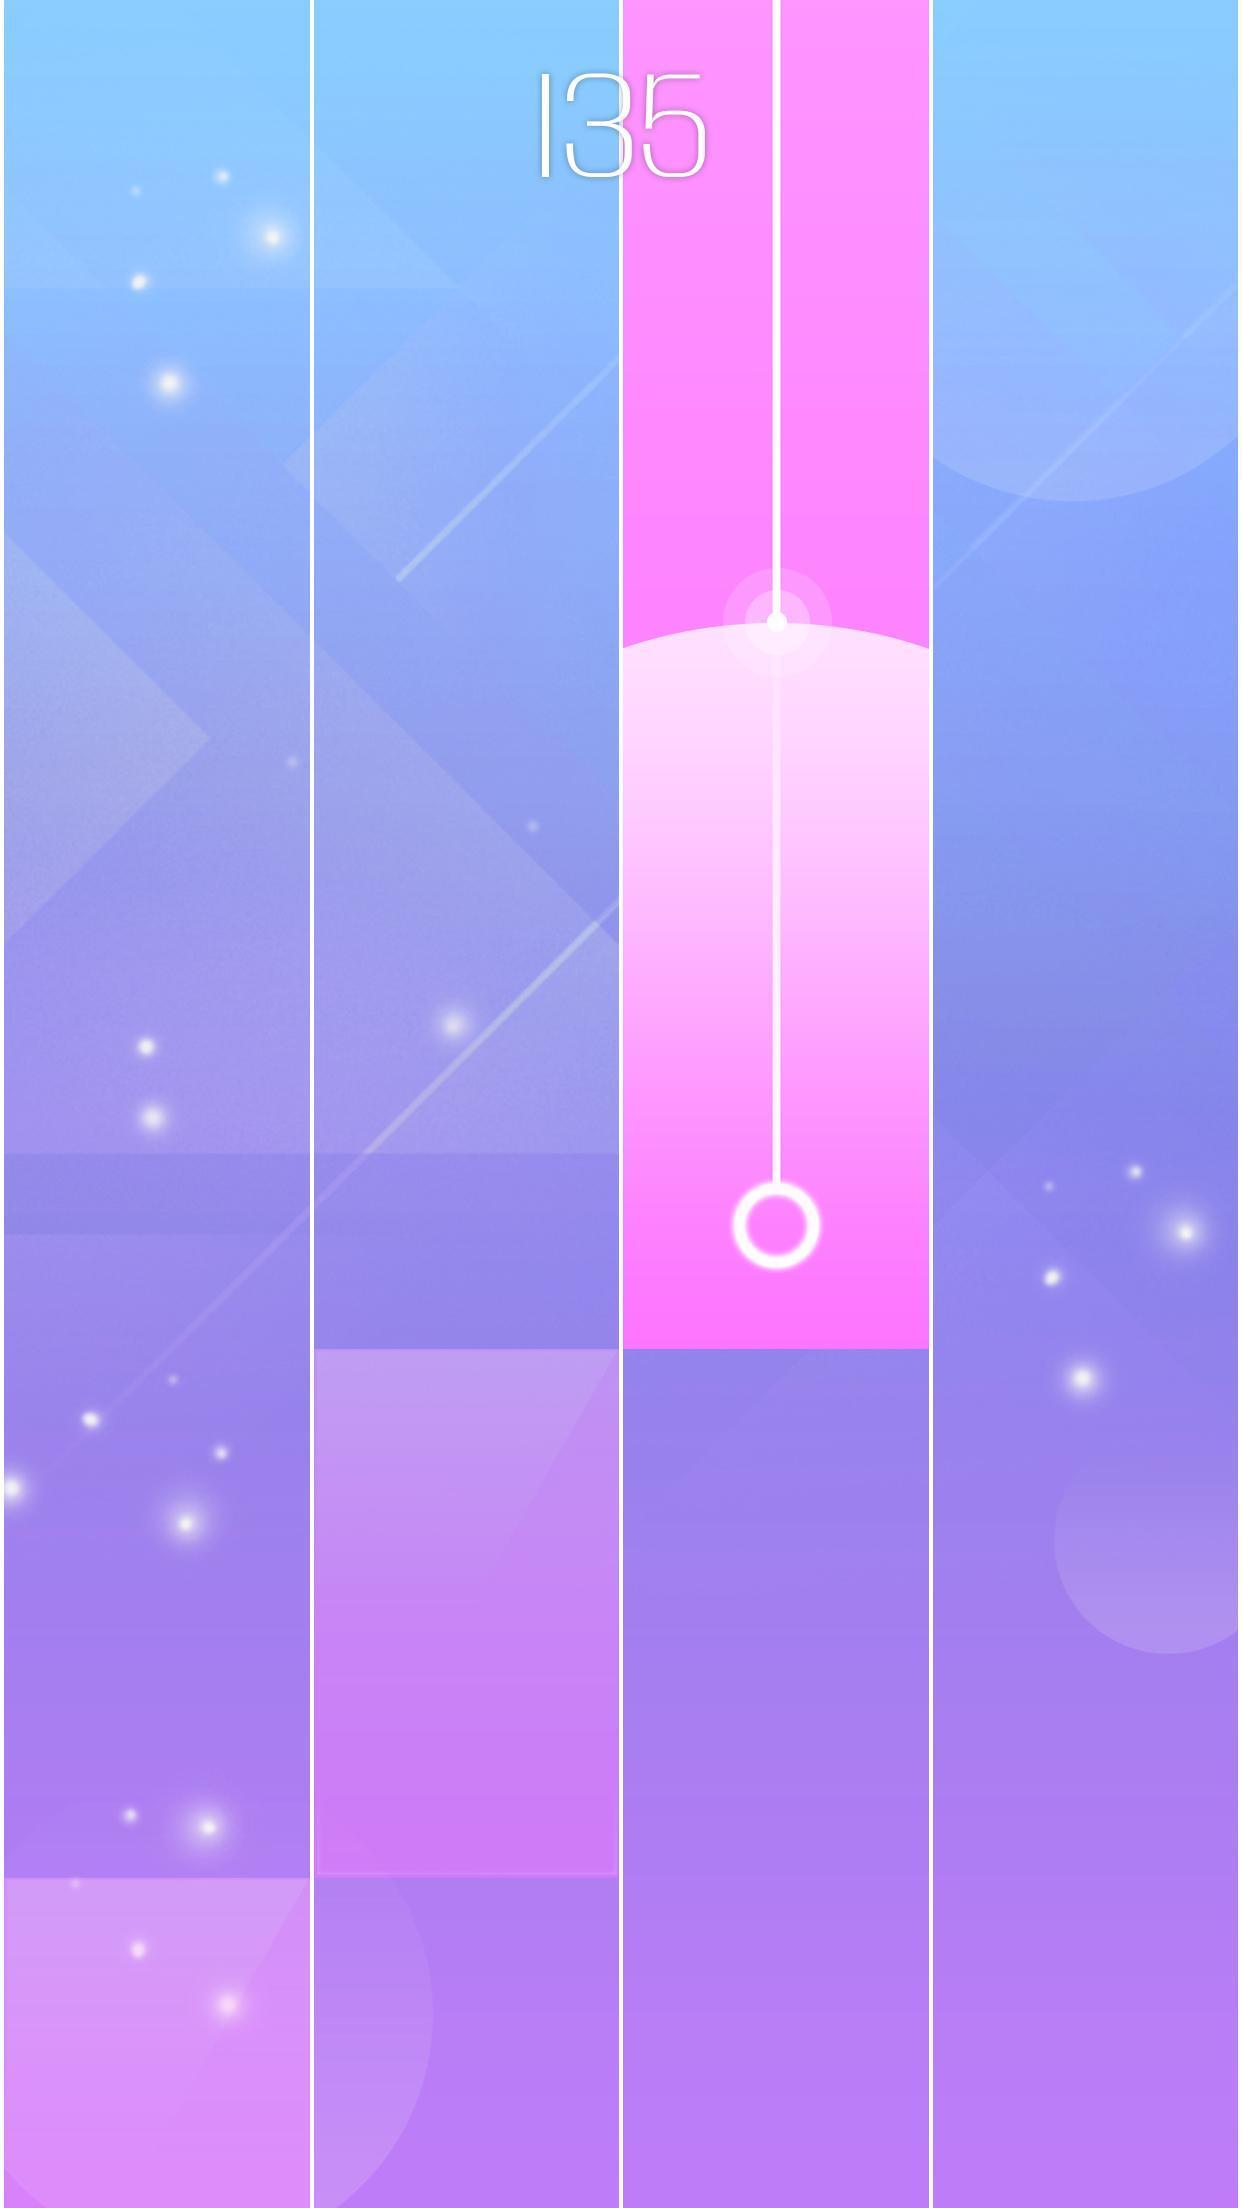 Best App For Kpop Songs